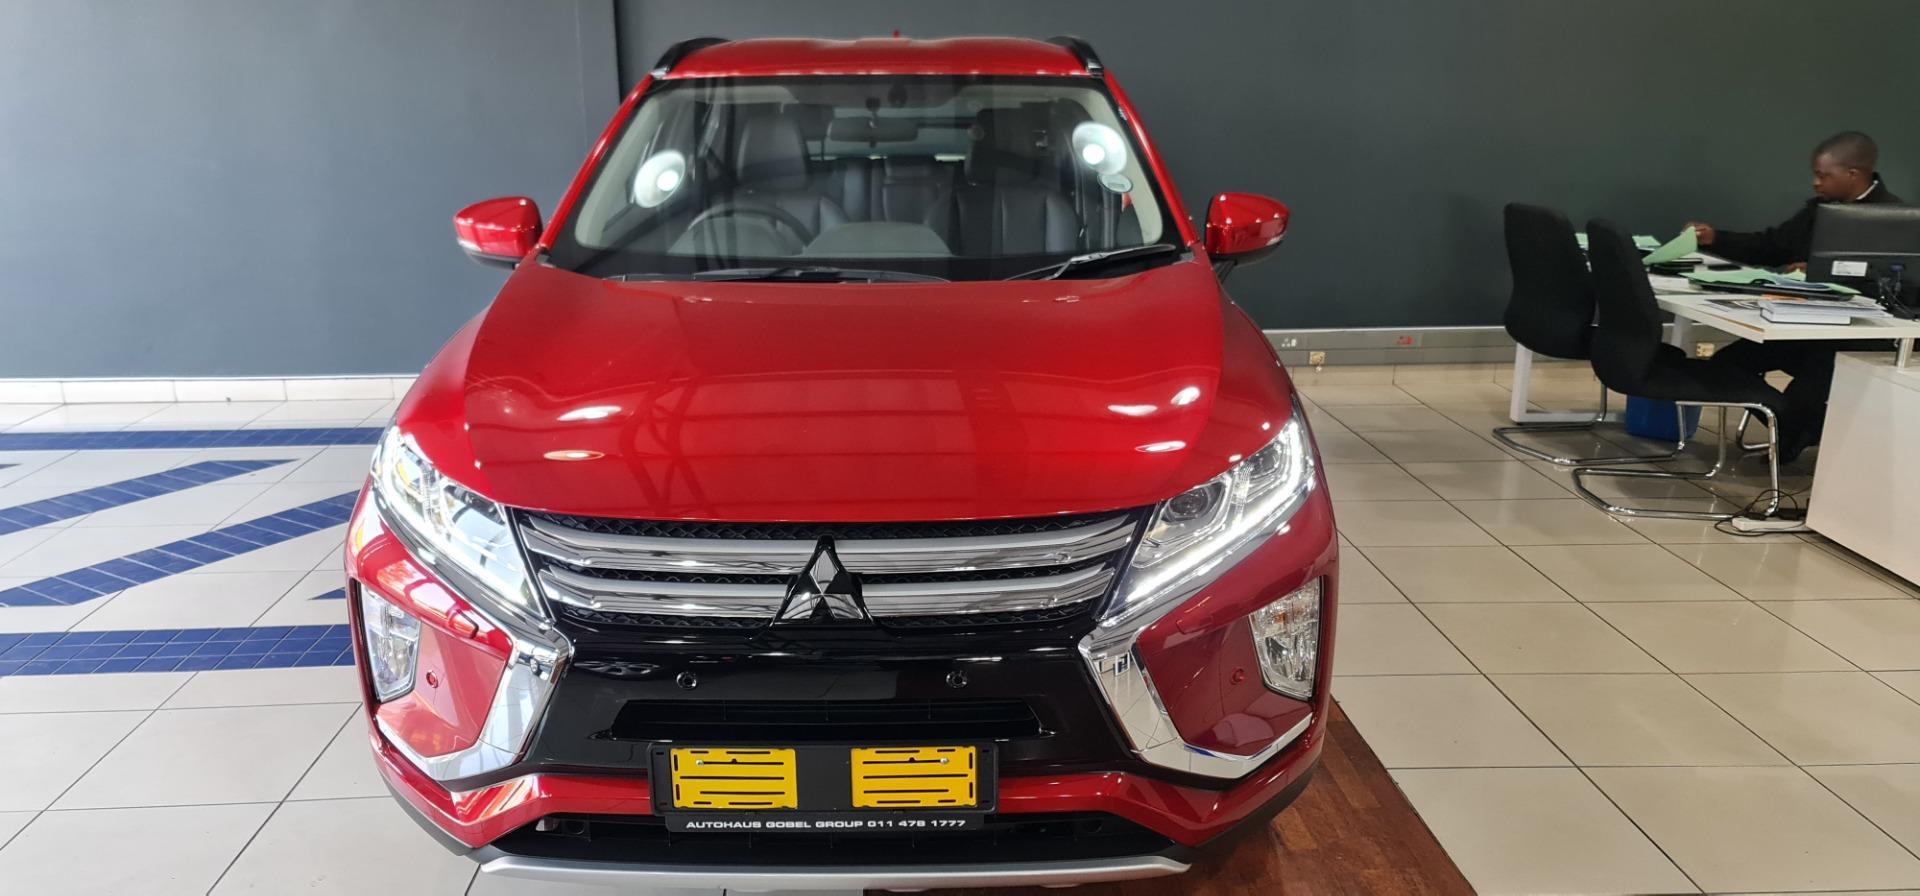 2021 Mitsubishi Eclipse Cross 2.0 Gls 4X2 Cvt